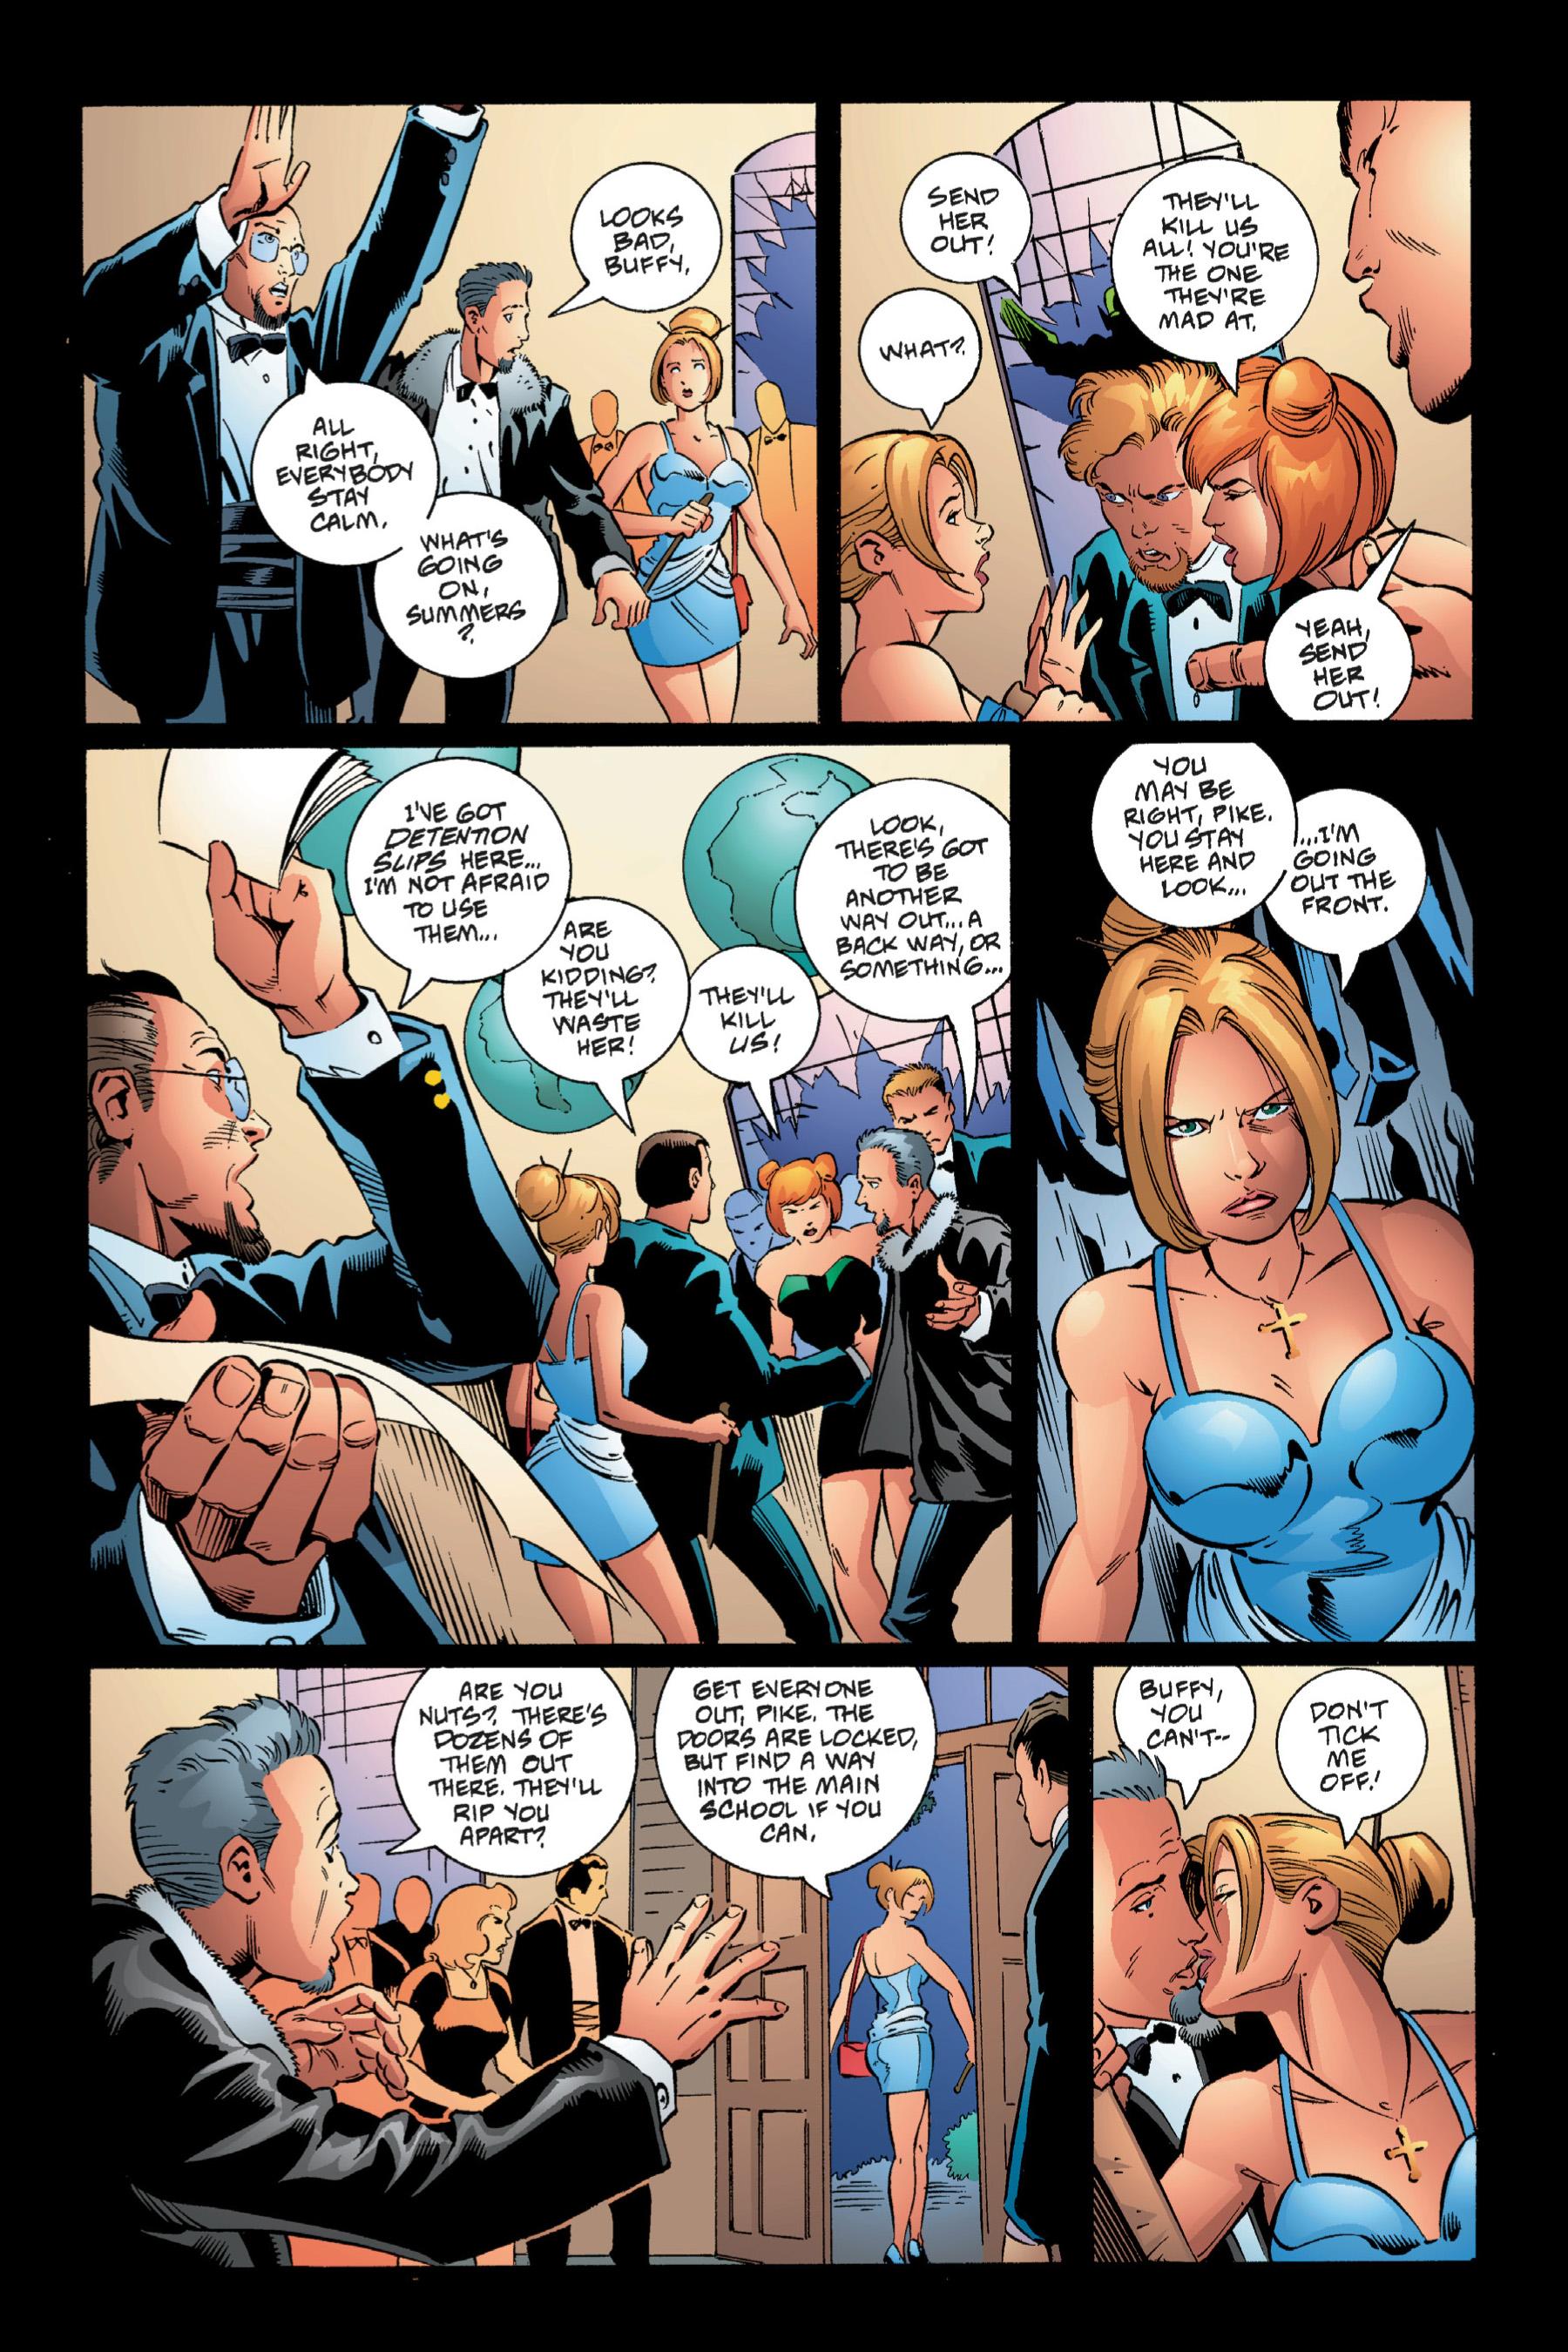 Read online Buffy the Vampire Slayer: Omnibus comic -  Issue # TPB 1 - 89